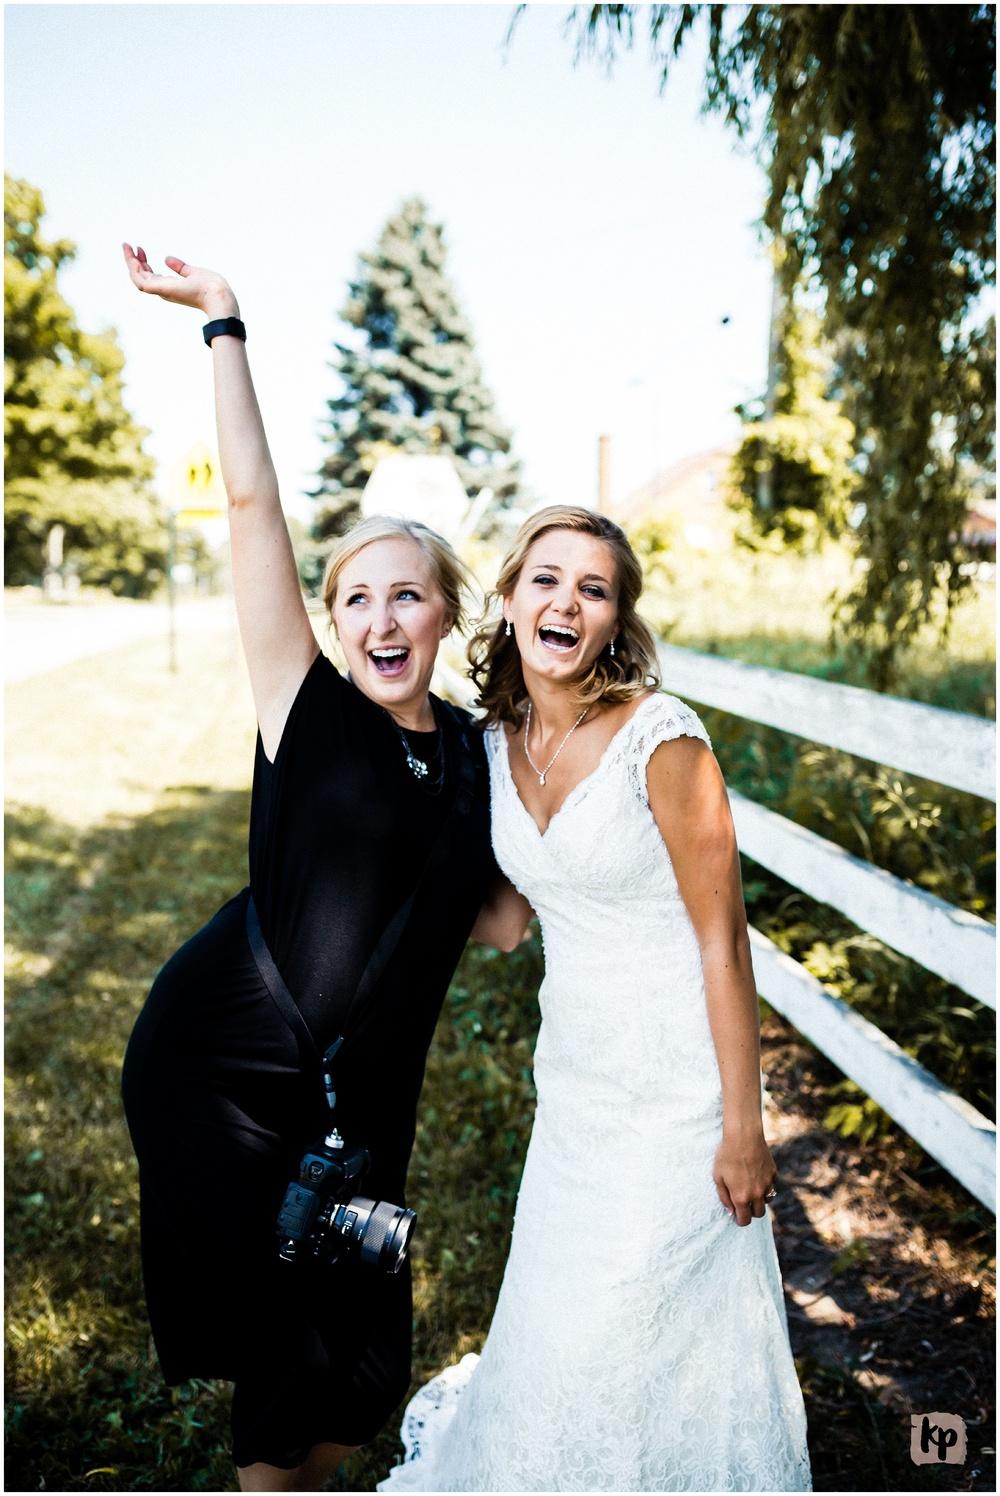 Andrew + Jessica | Just Married #kyleepaigephotography_0140.jpg